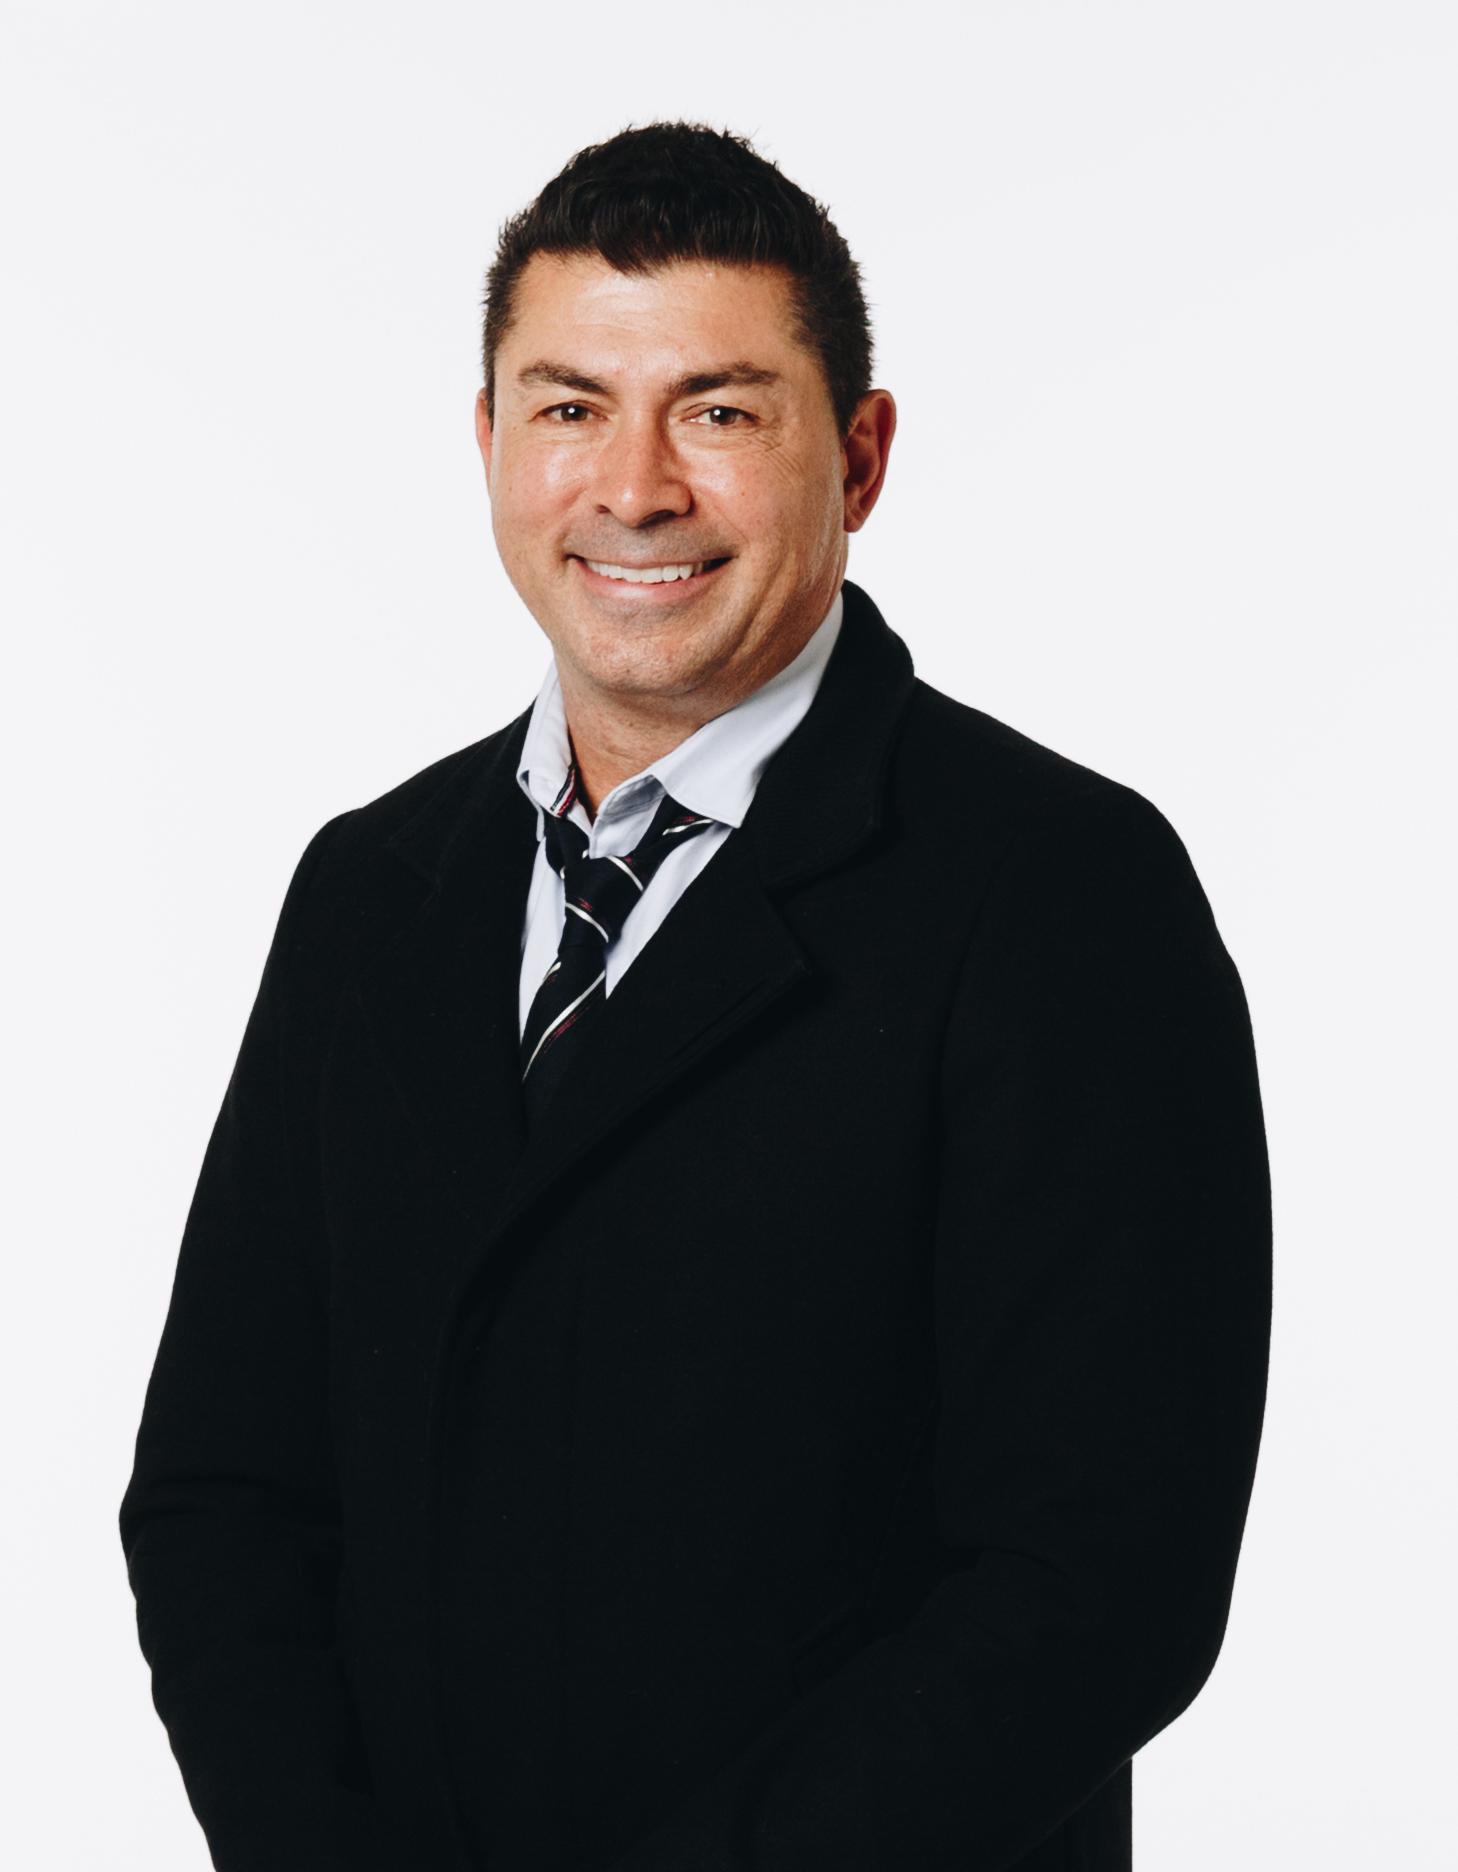 Tony Moschella